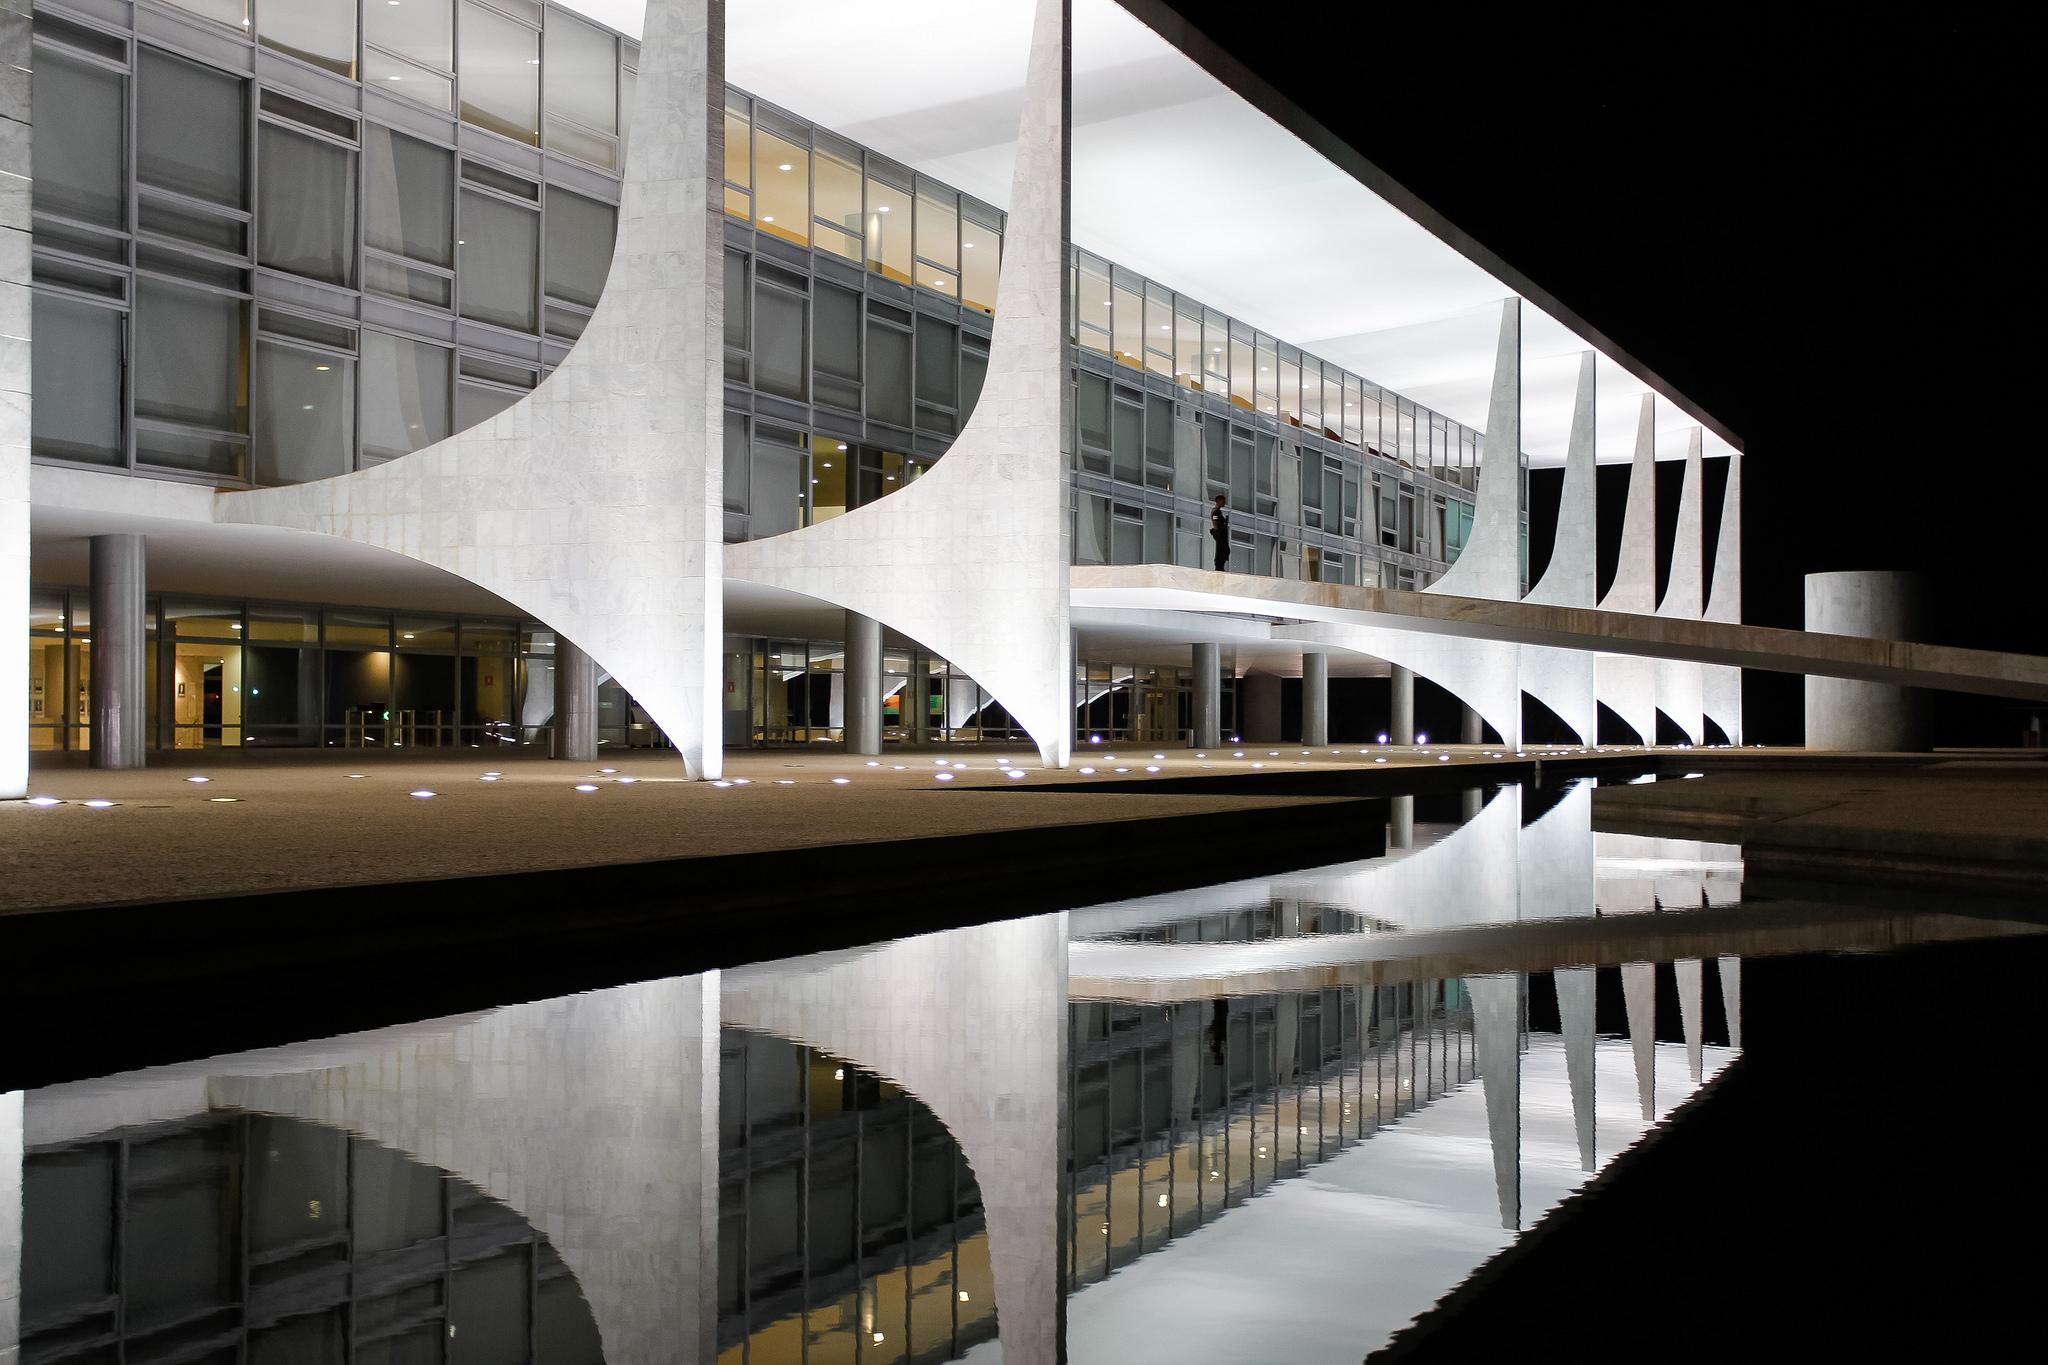 Brasília - monumentos e prédios públicos - Palácio do Planalto